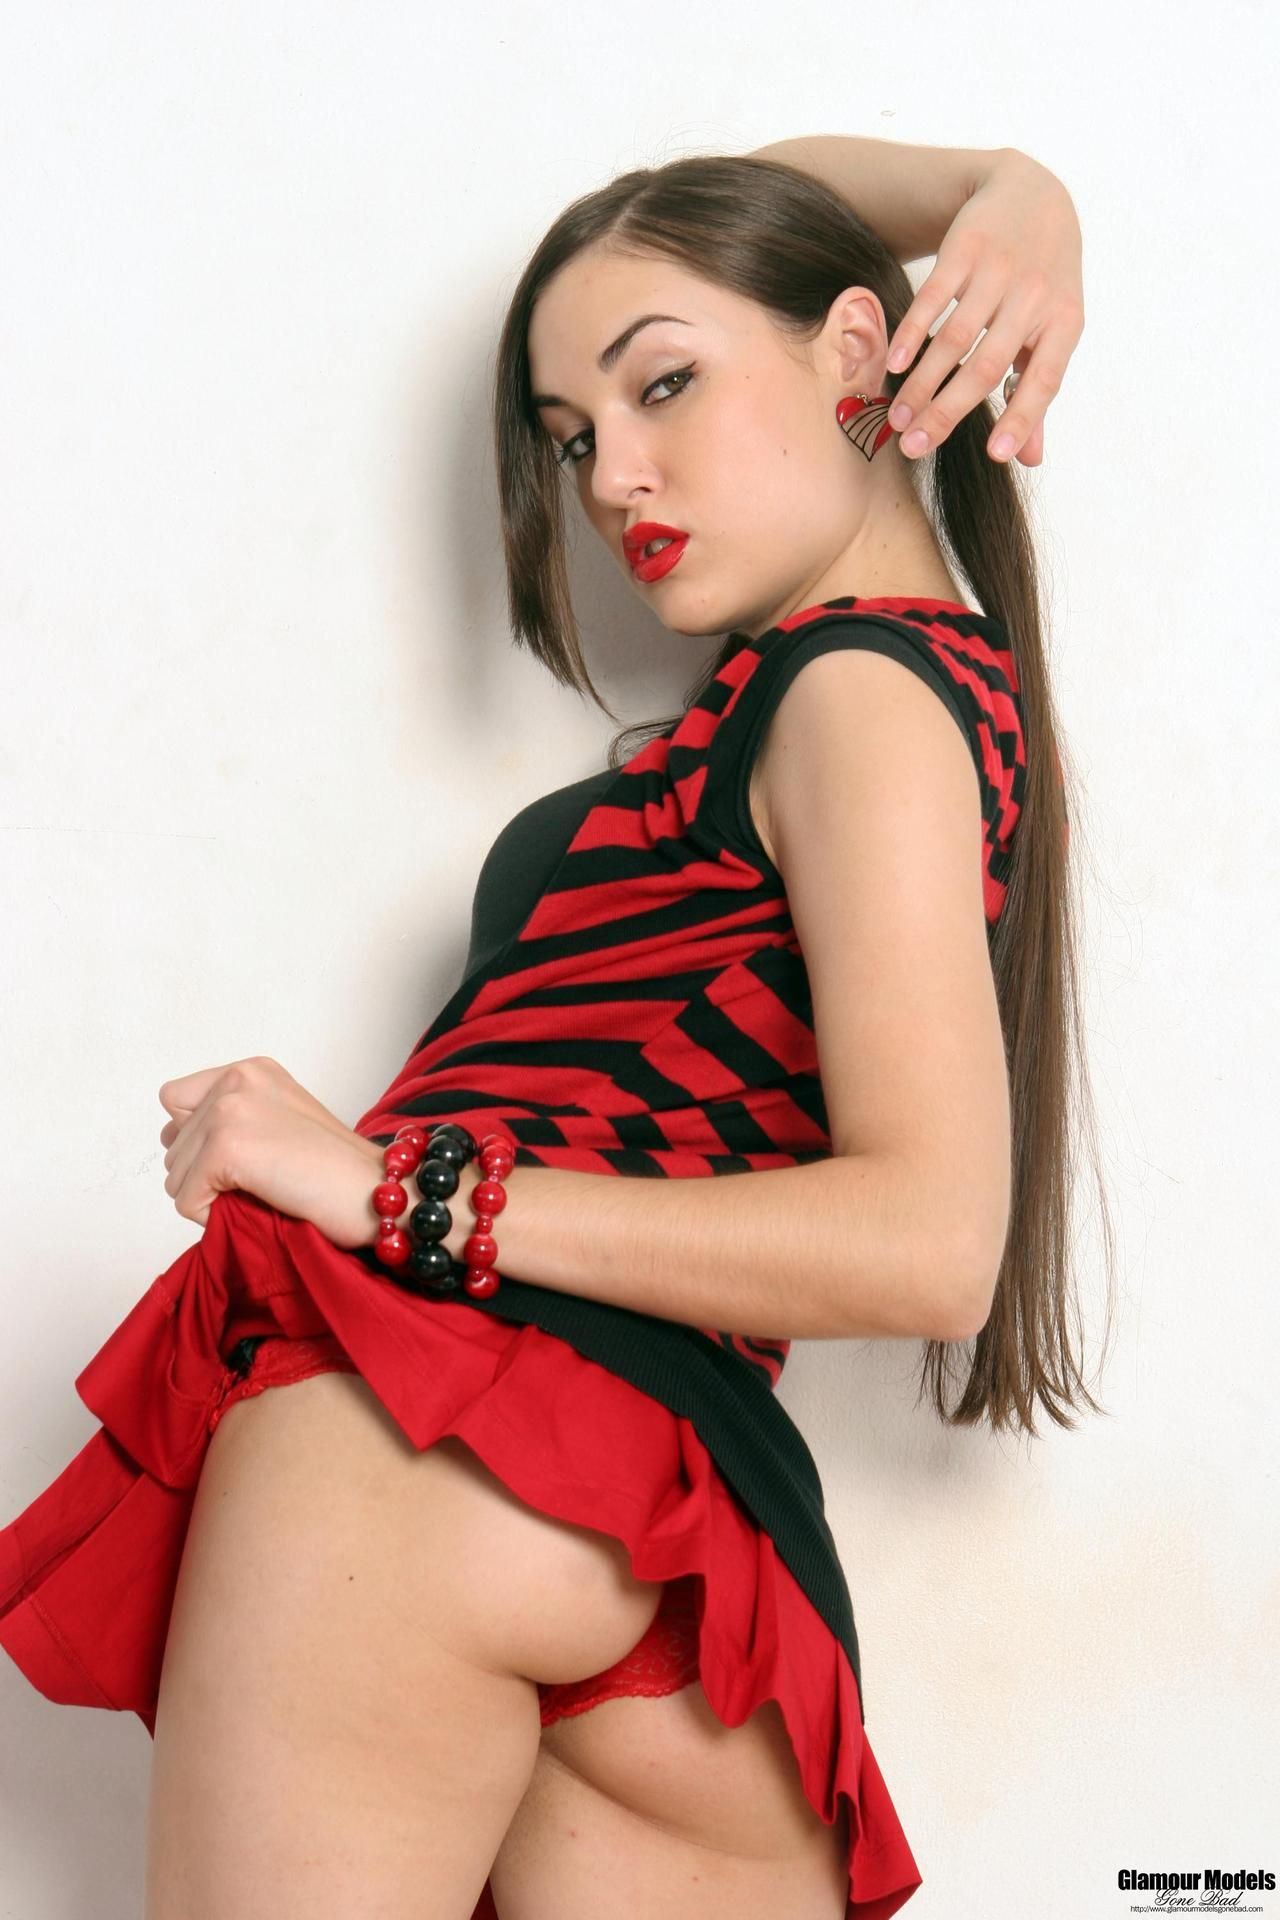 Sexy Cheerleader Xxx Top best hot girls pics • porn star sasha grey is so freaking hot. | x